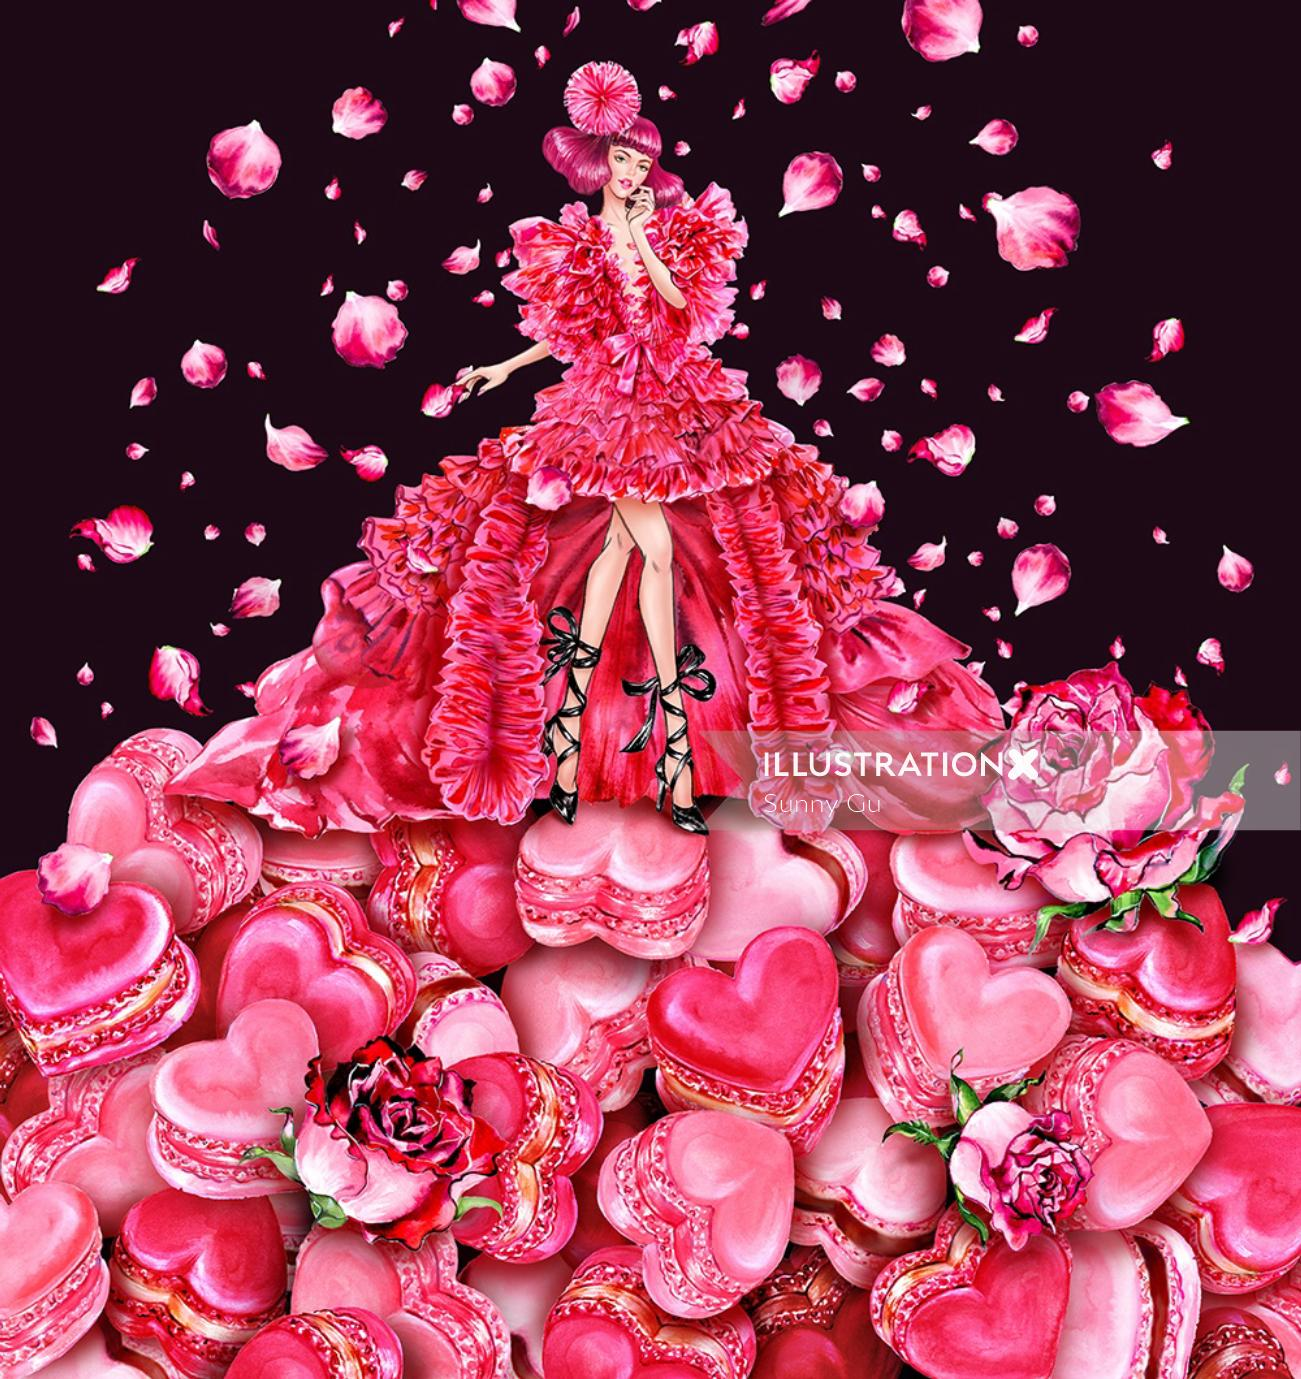 woman is wearing Schiaparelli couture dress